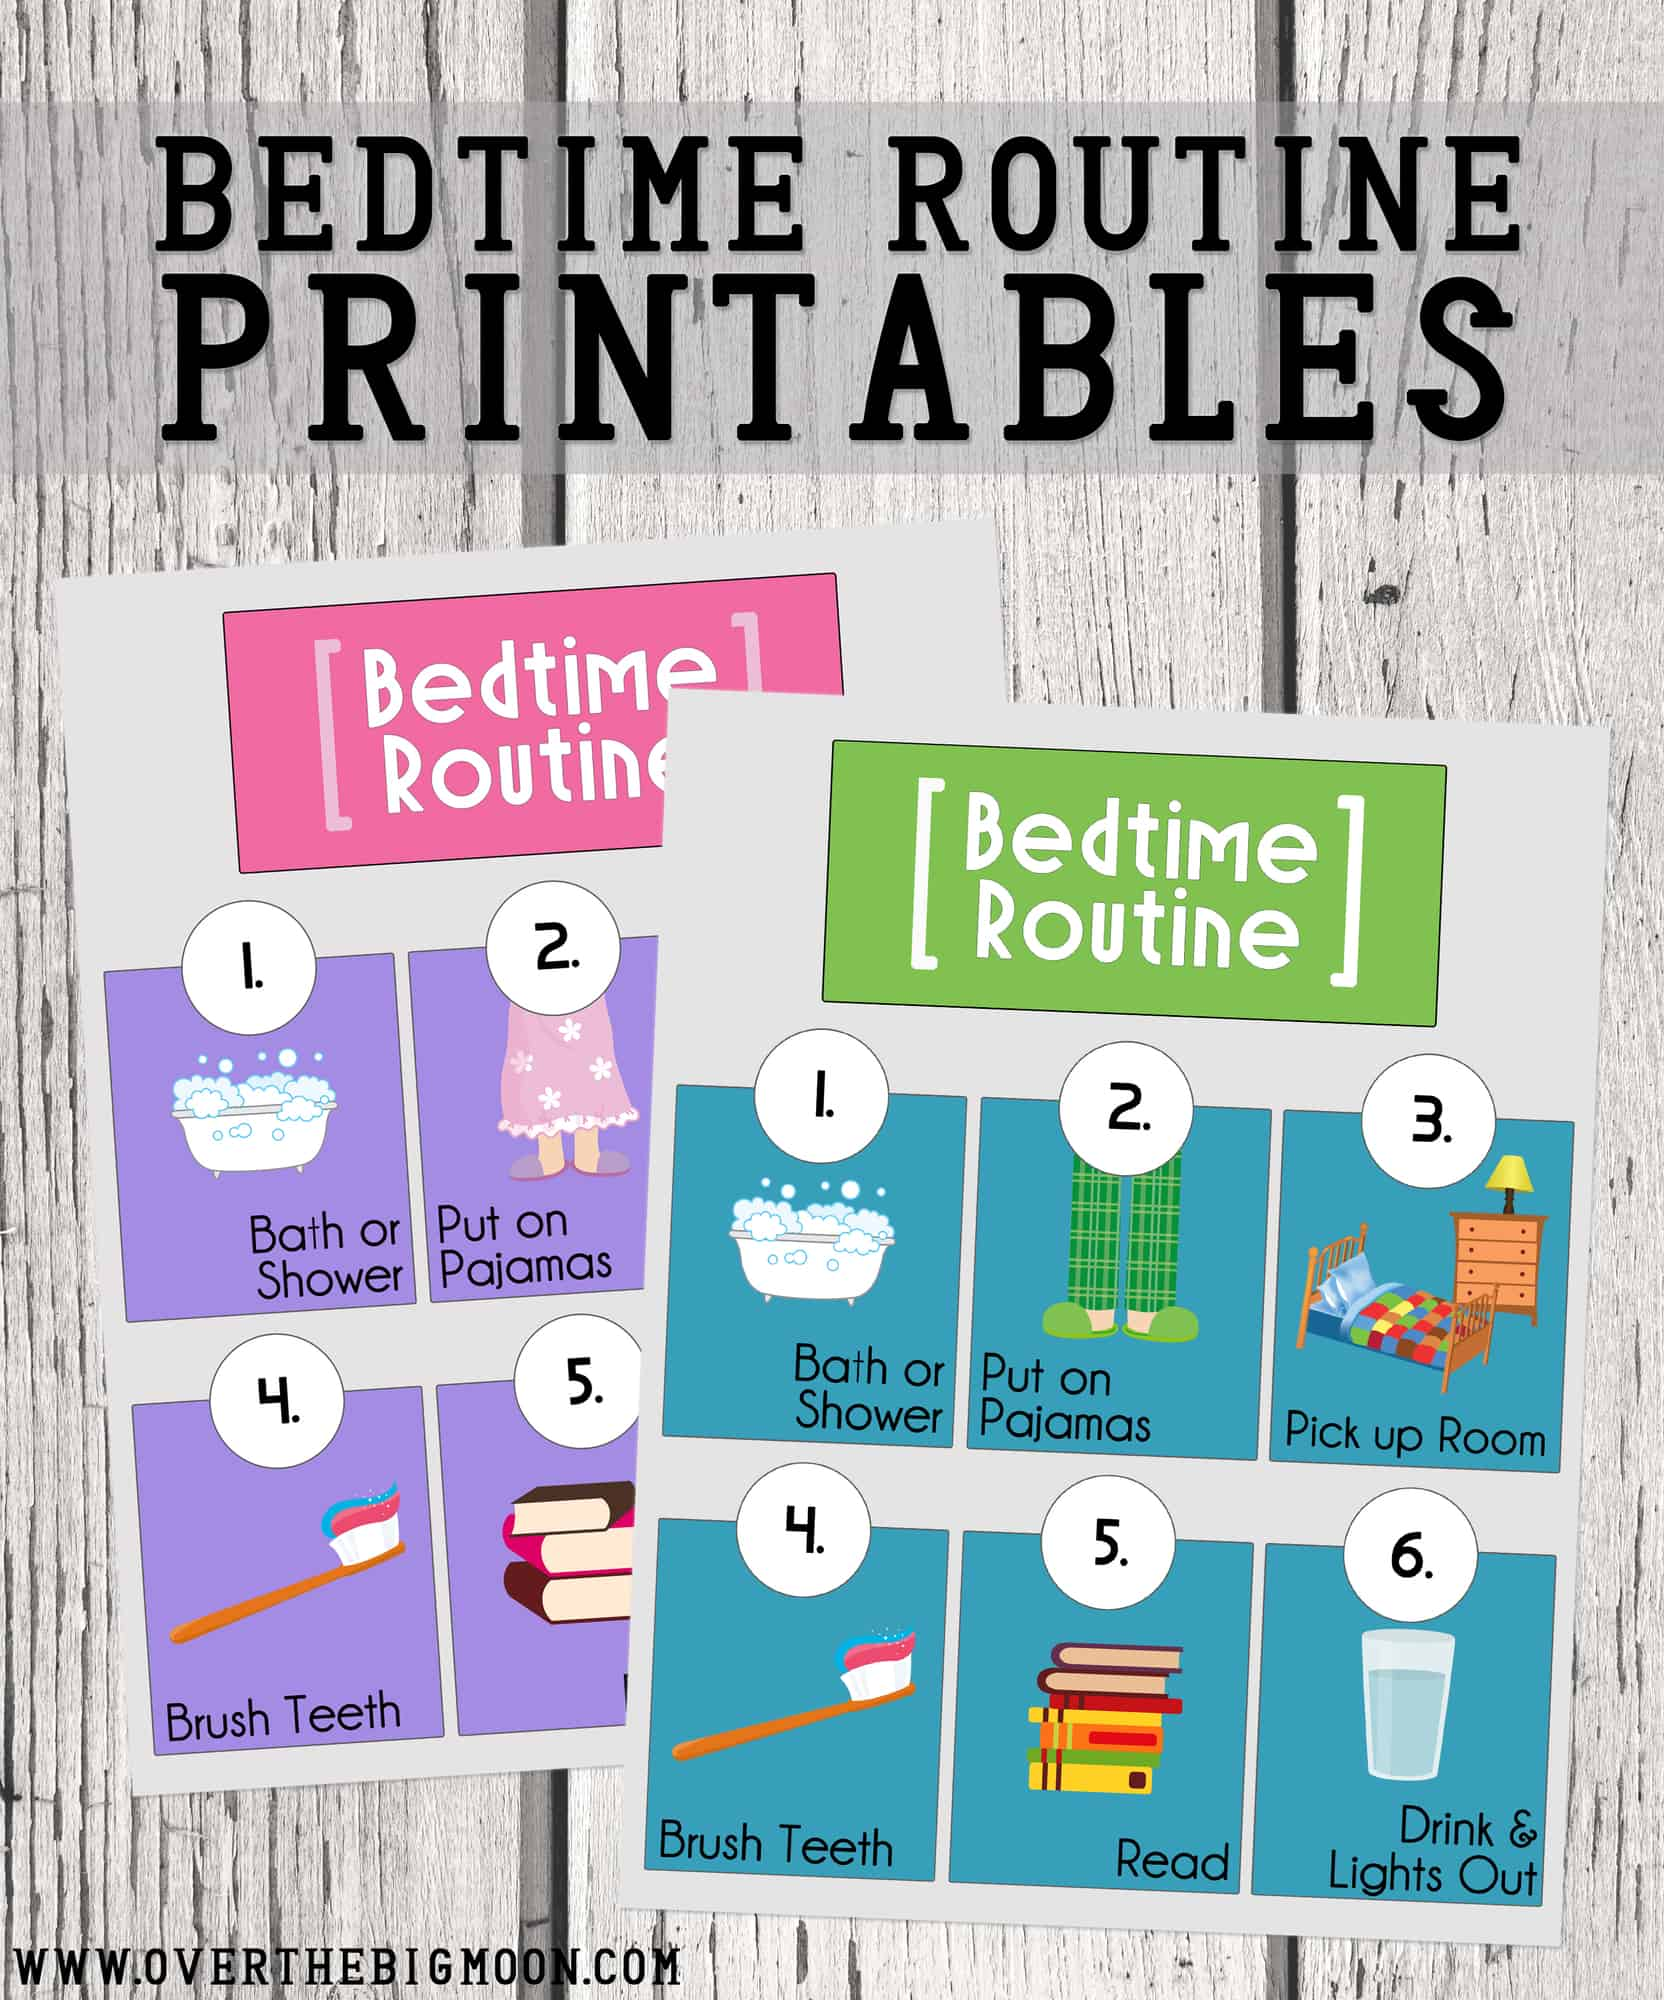 Bedtime Routine Printables